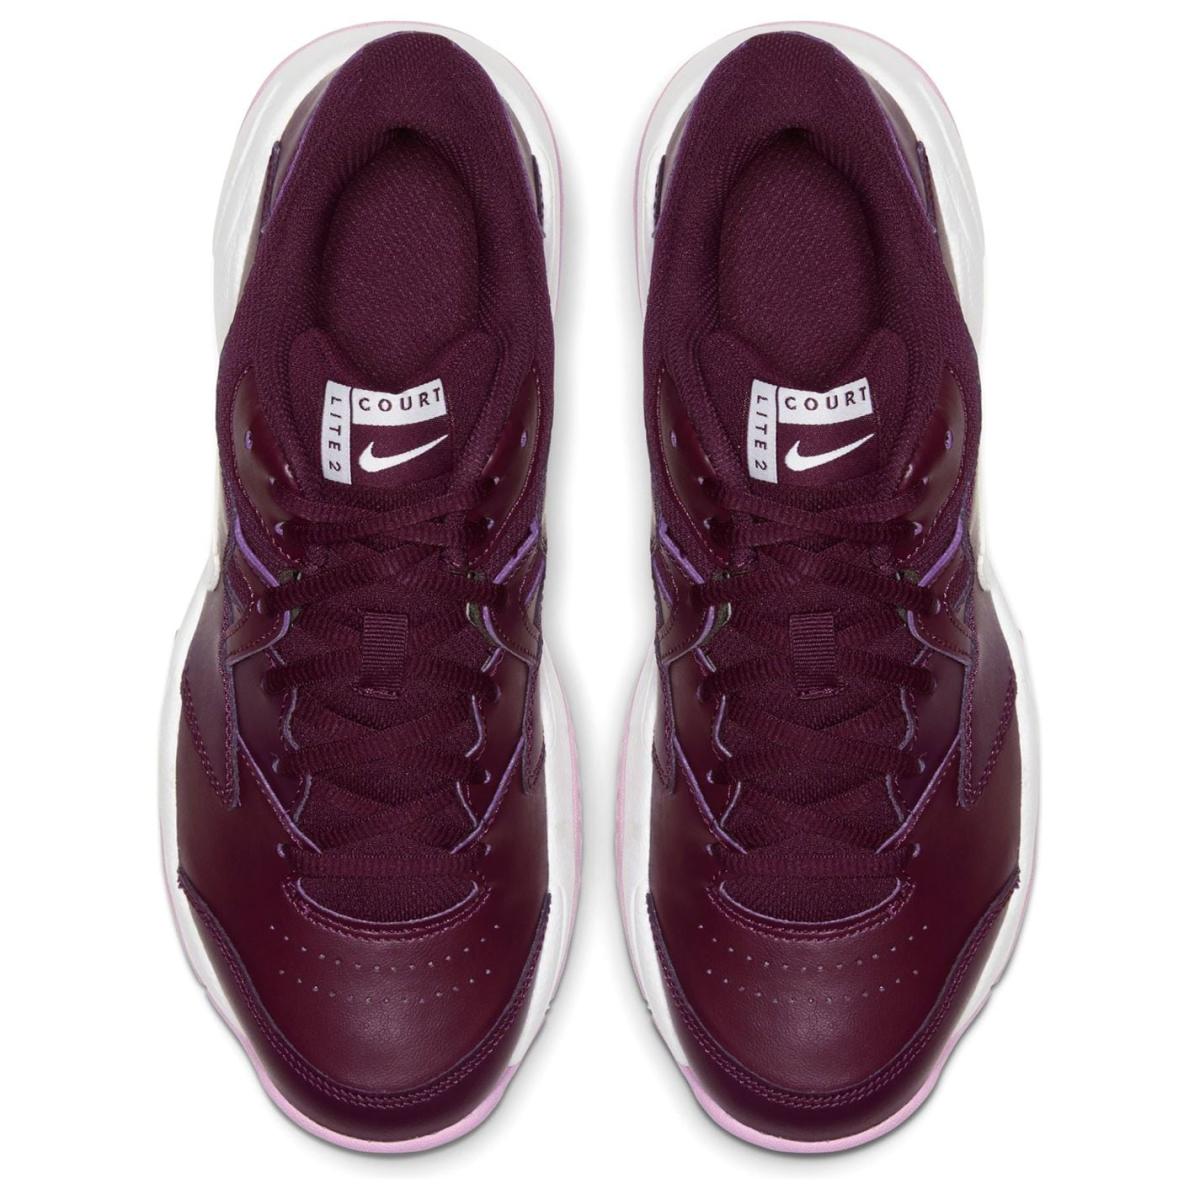 Nike Court Lite 2 Turnschuhe Tennisschuhe Damen Tennis Schuhe Sneakers 6174